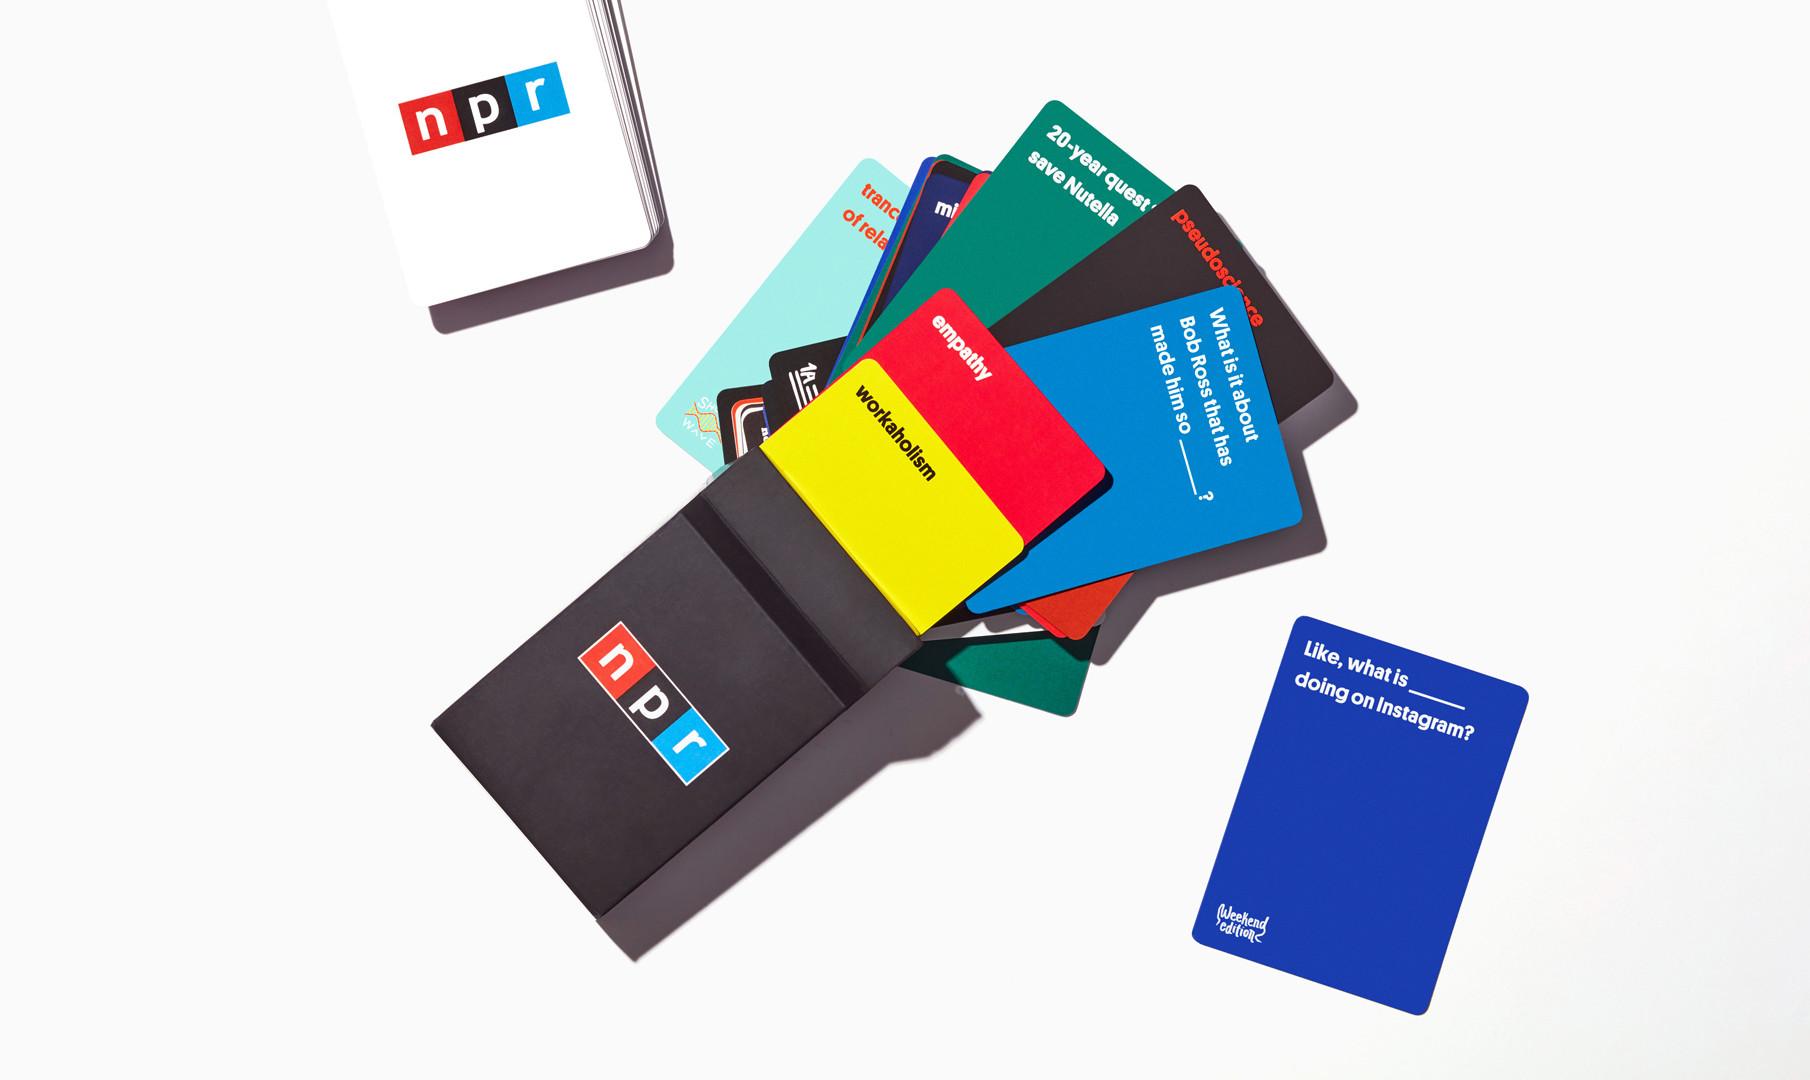 NPR_CARDS_2-1.jpg